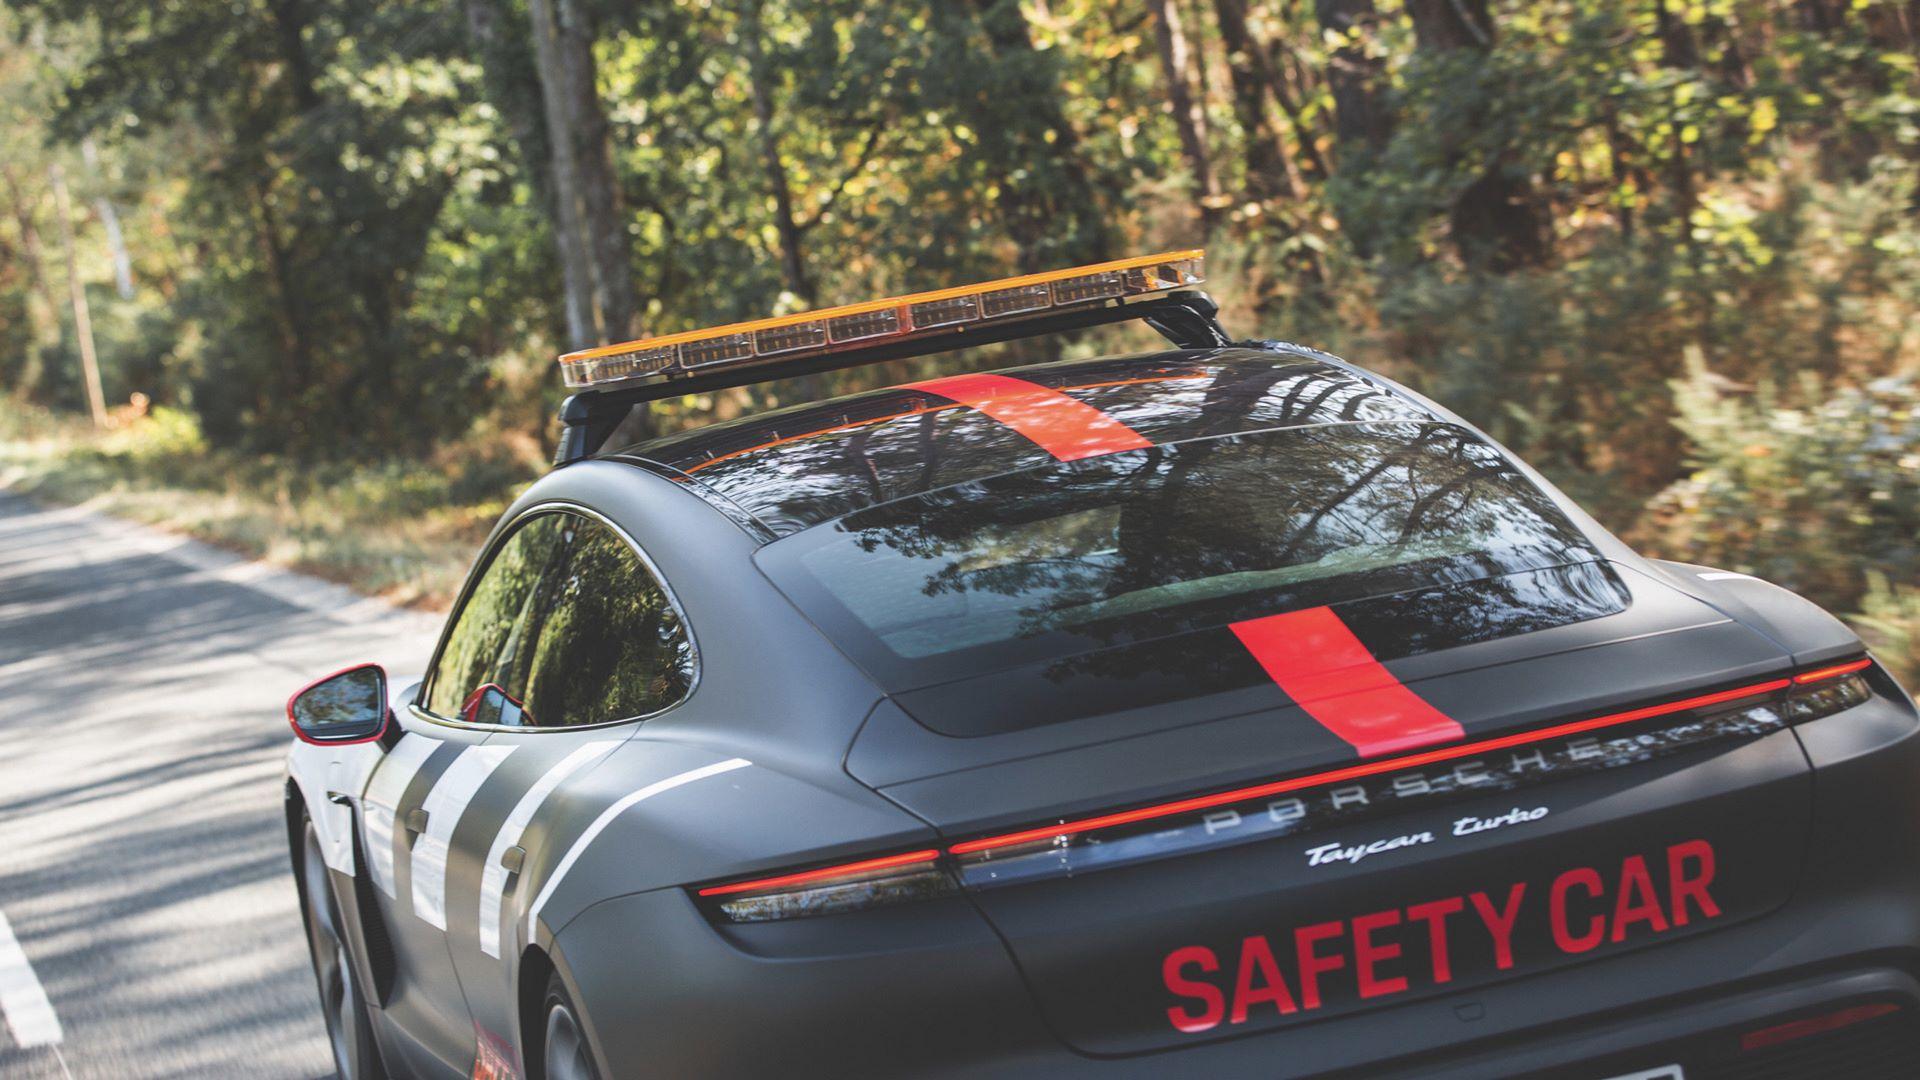 Porsche-Taycan-Turbo-safety-car-Le-Mans-2020-14